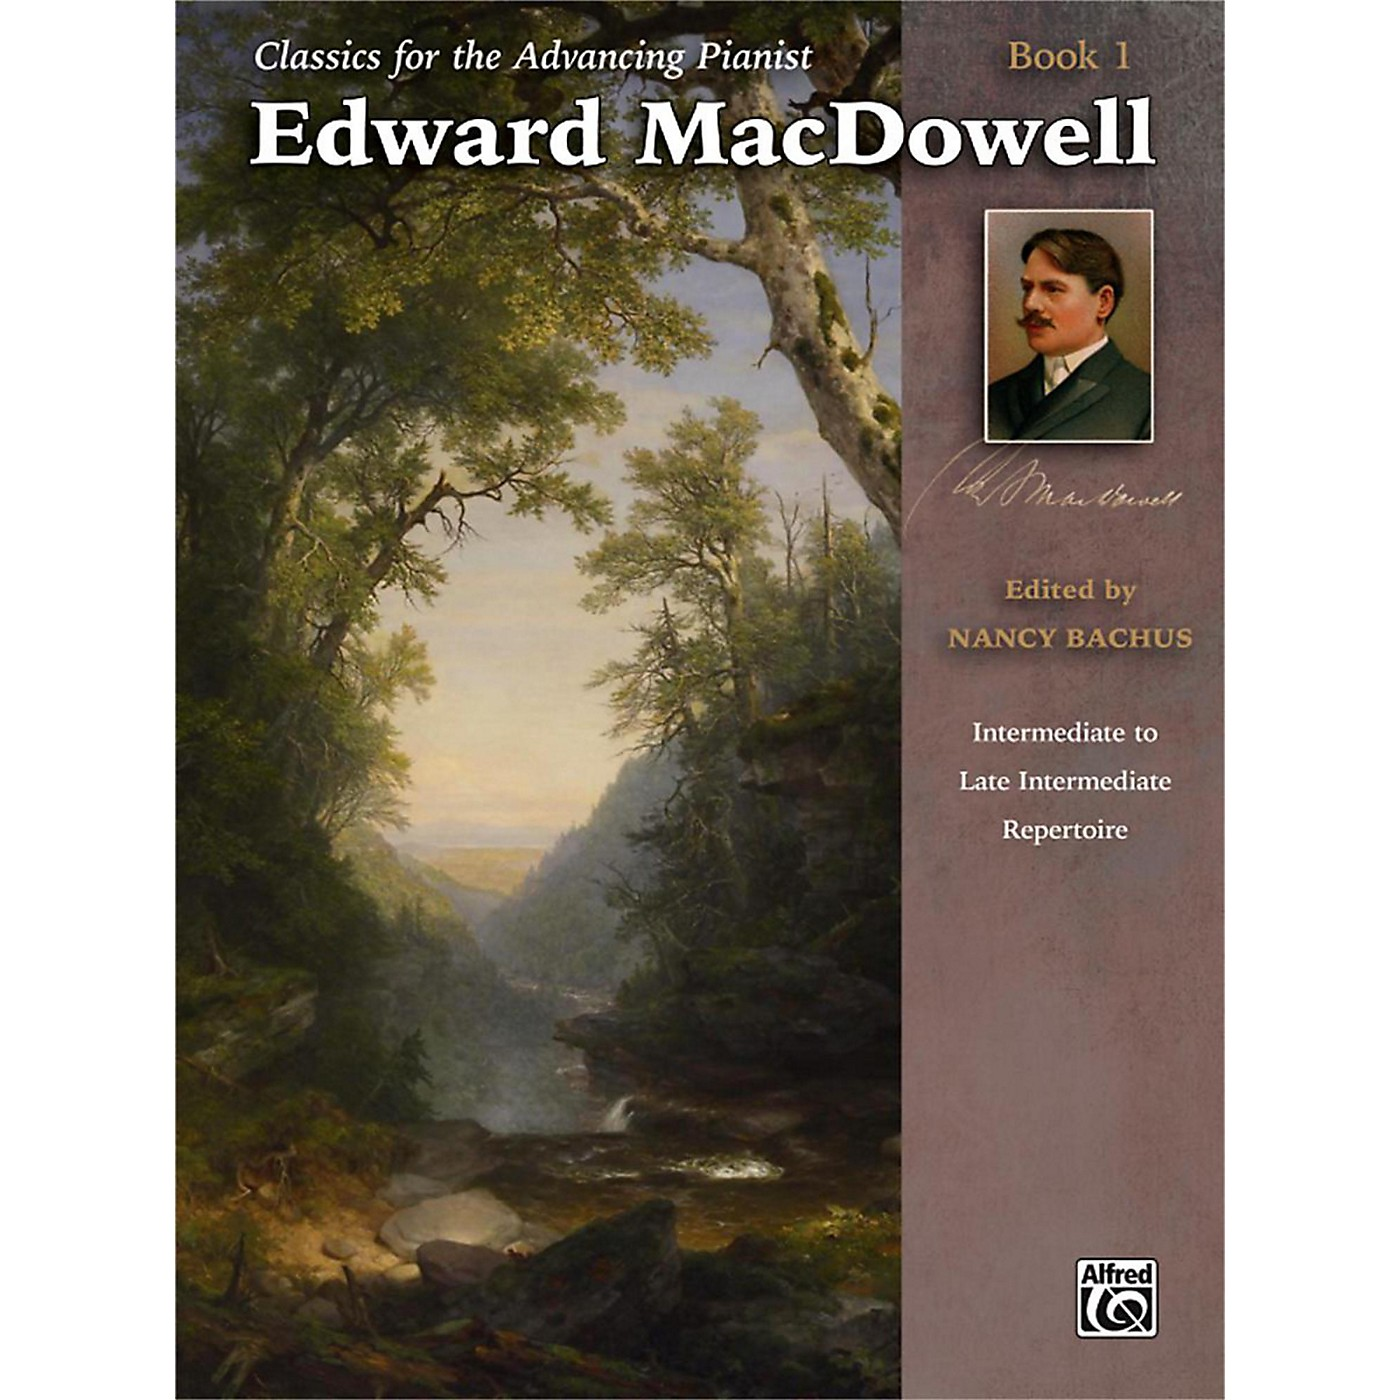 Alfred Classics for the Advancing Pianist: Edward MacDowell Book 1 Intermediate / Late Intermediate thumbnail